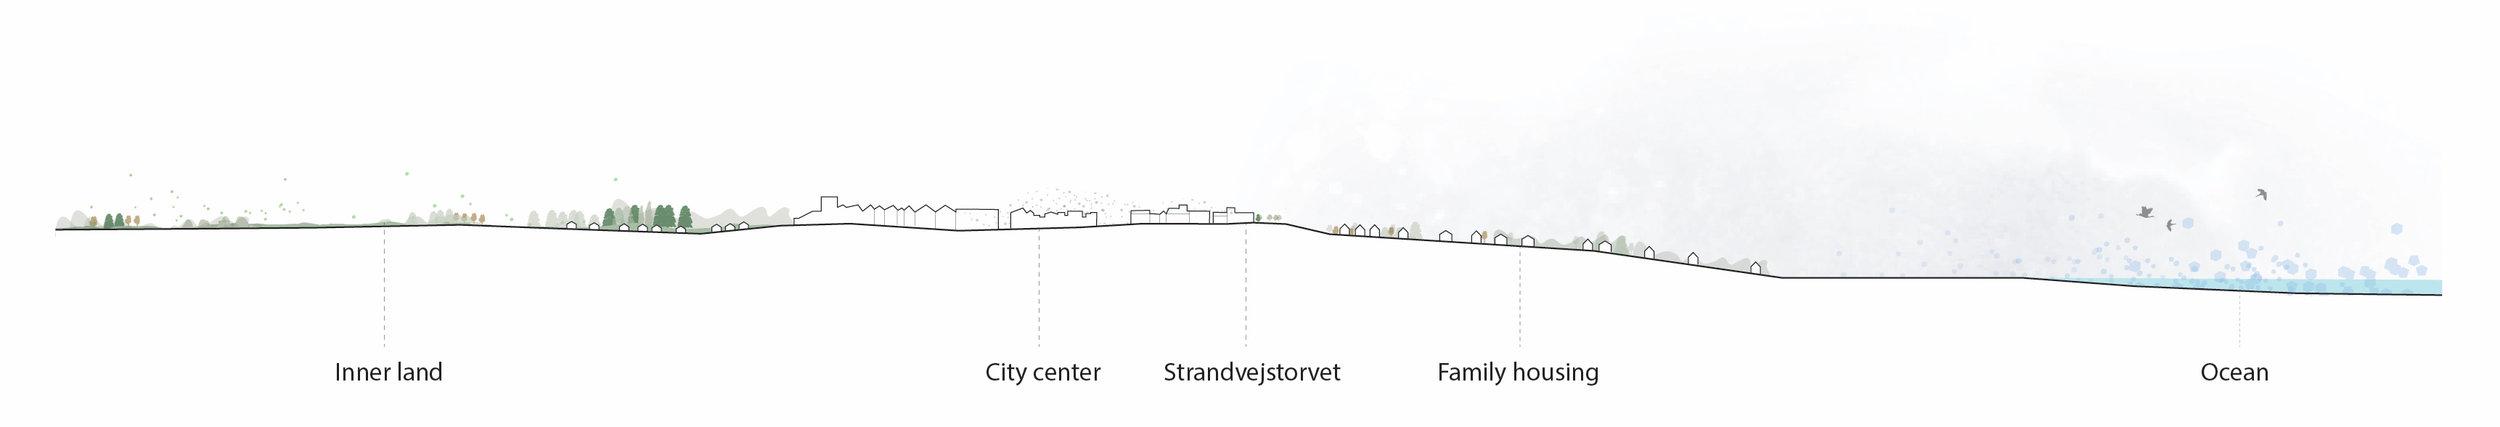 Diagram_Strandvejstorv_sgn-01-kopi.jpg